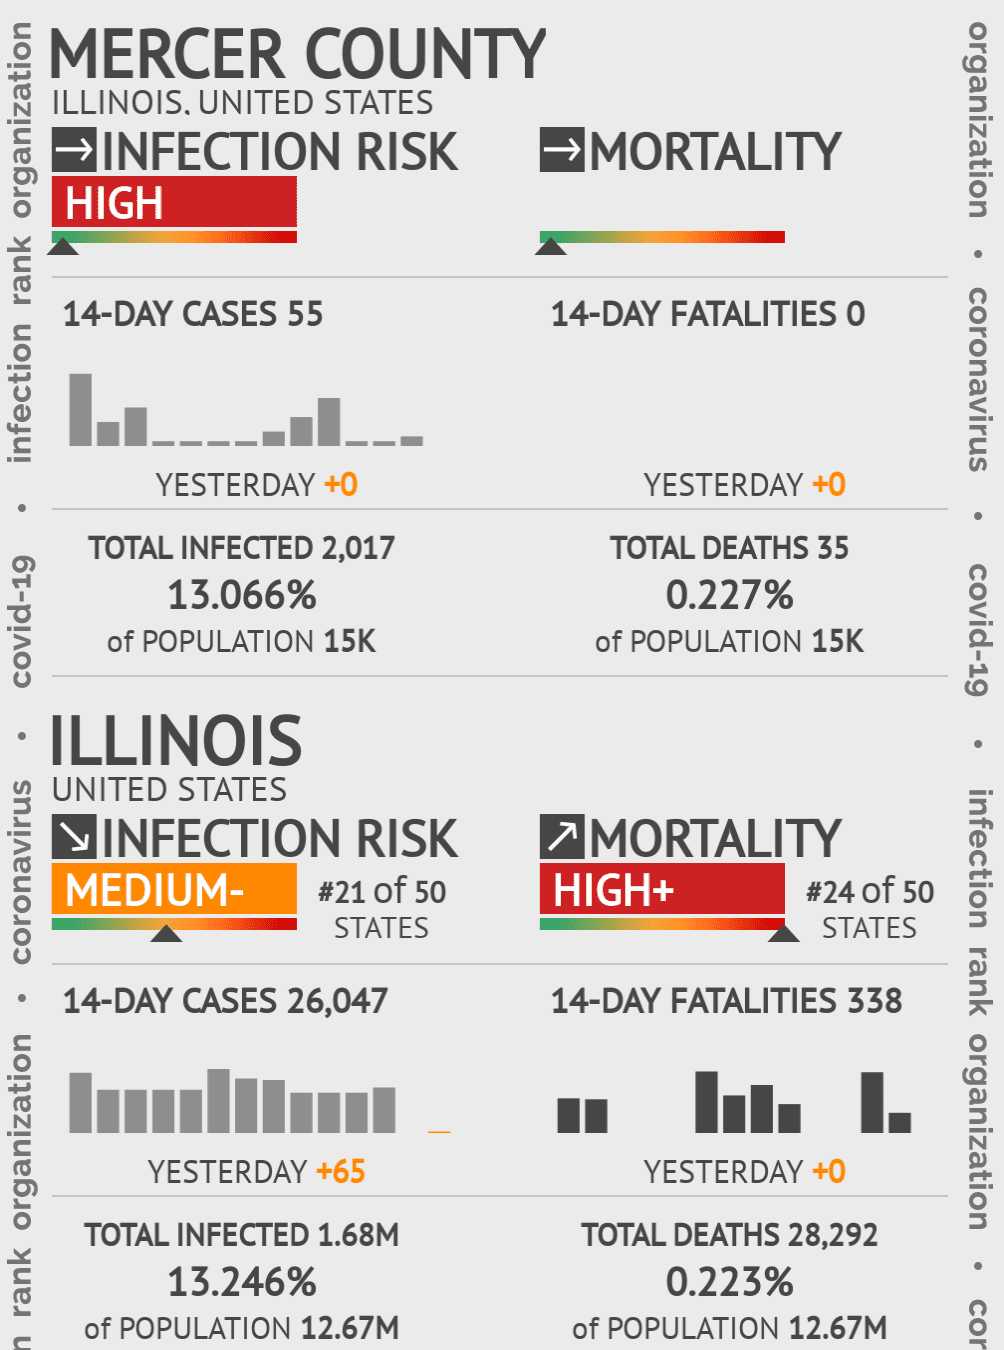 Mercer County Coronavirus Covid-19 Risk of Infection on October 16, 2020